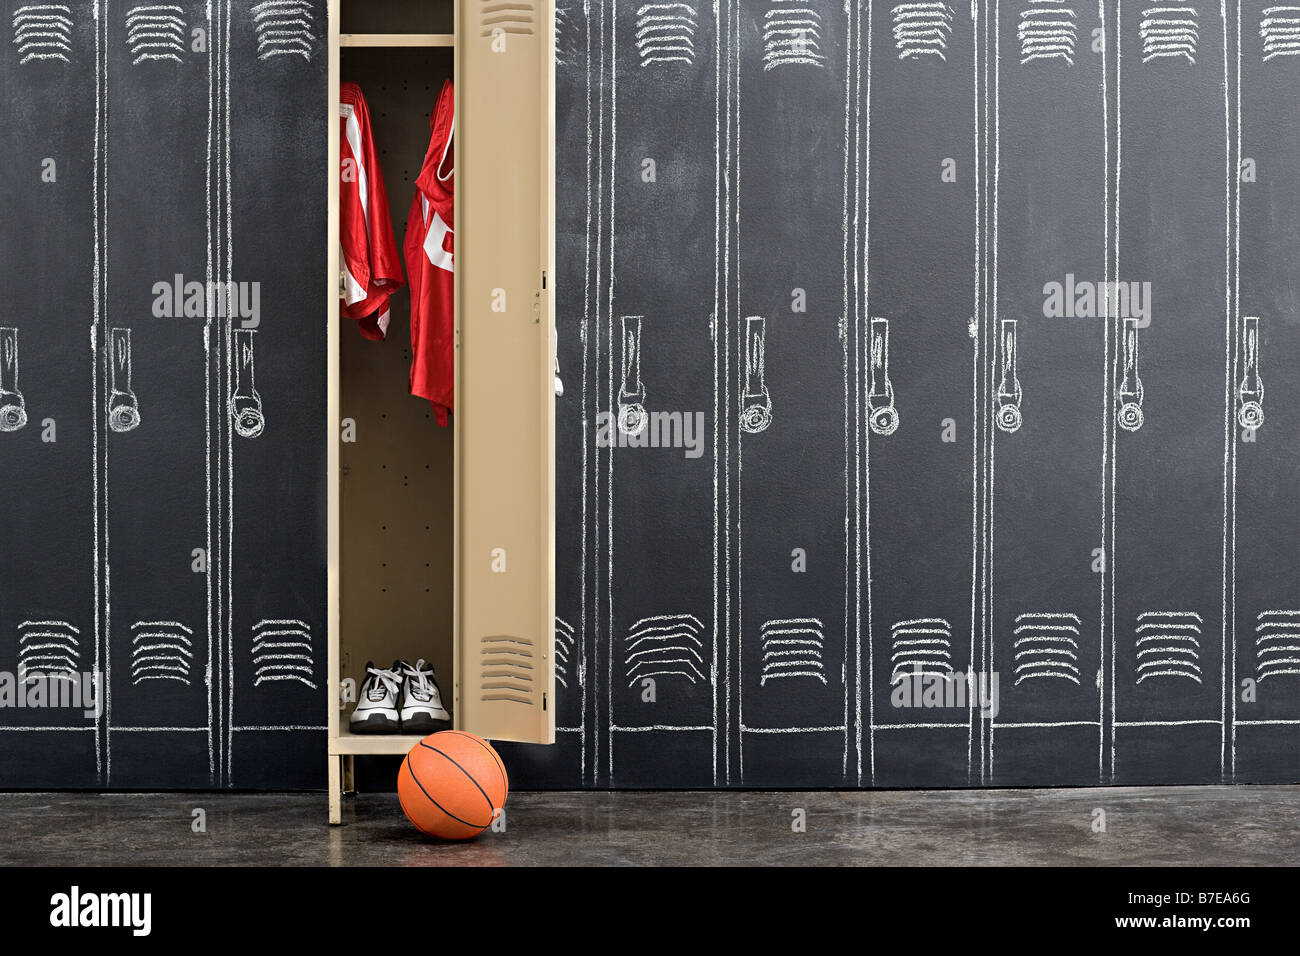 Basketball uniform hanging in a locker Stock Photo